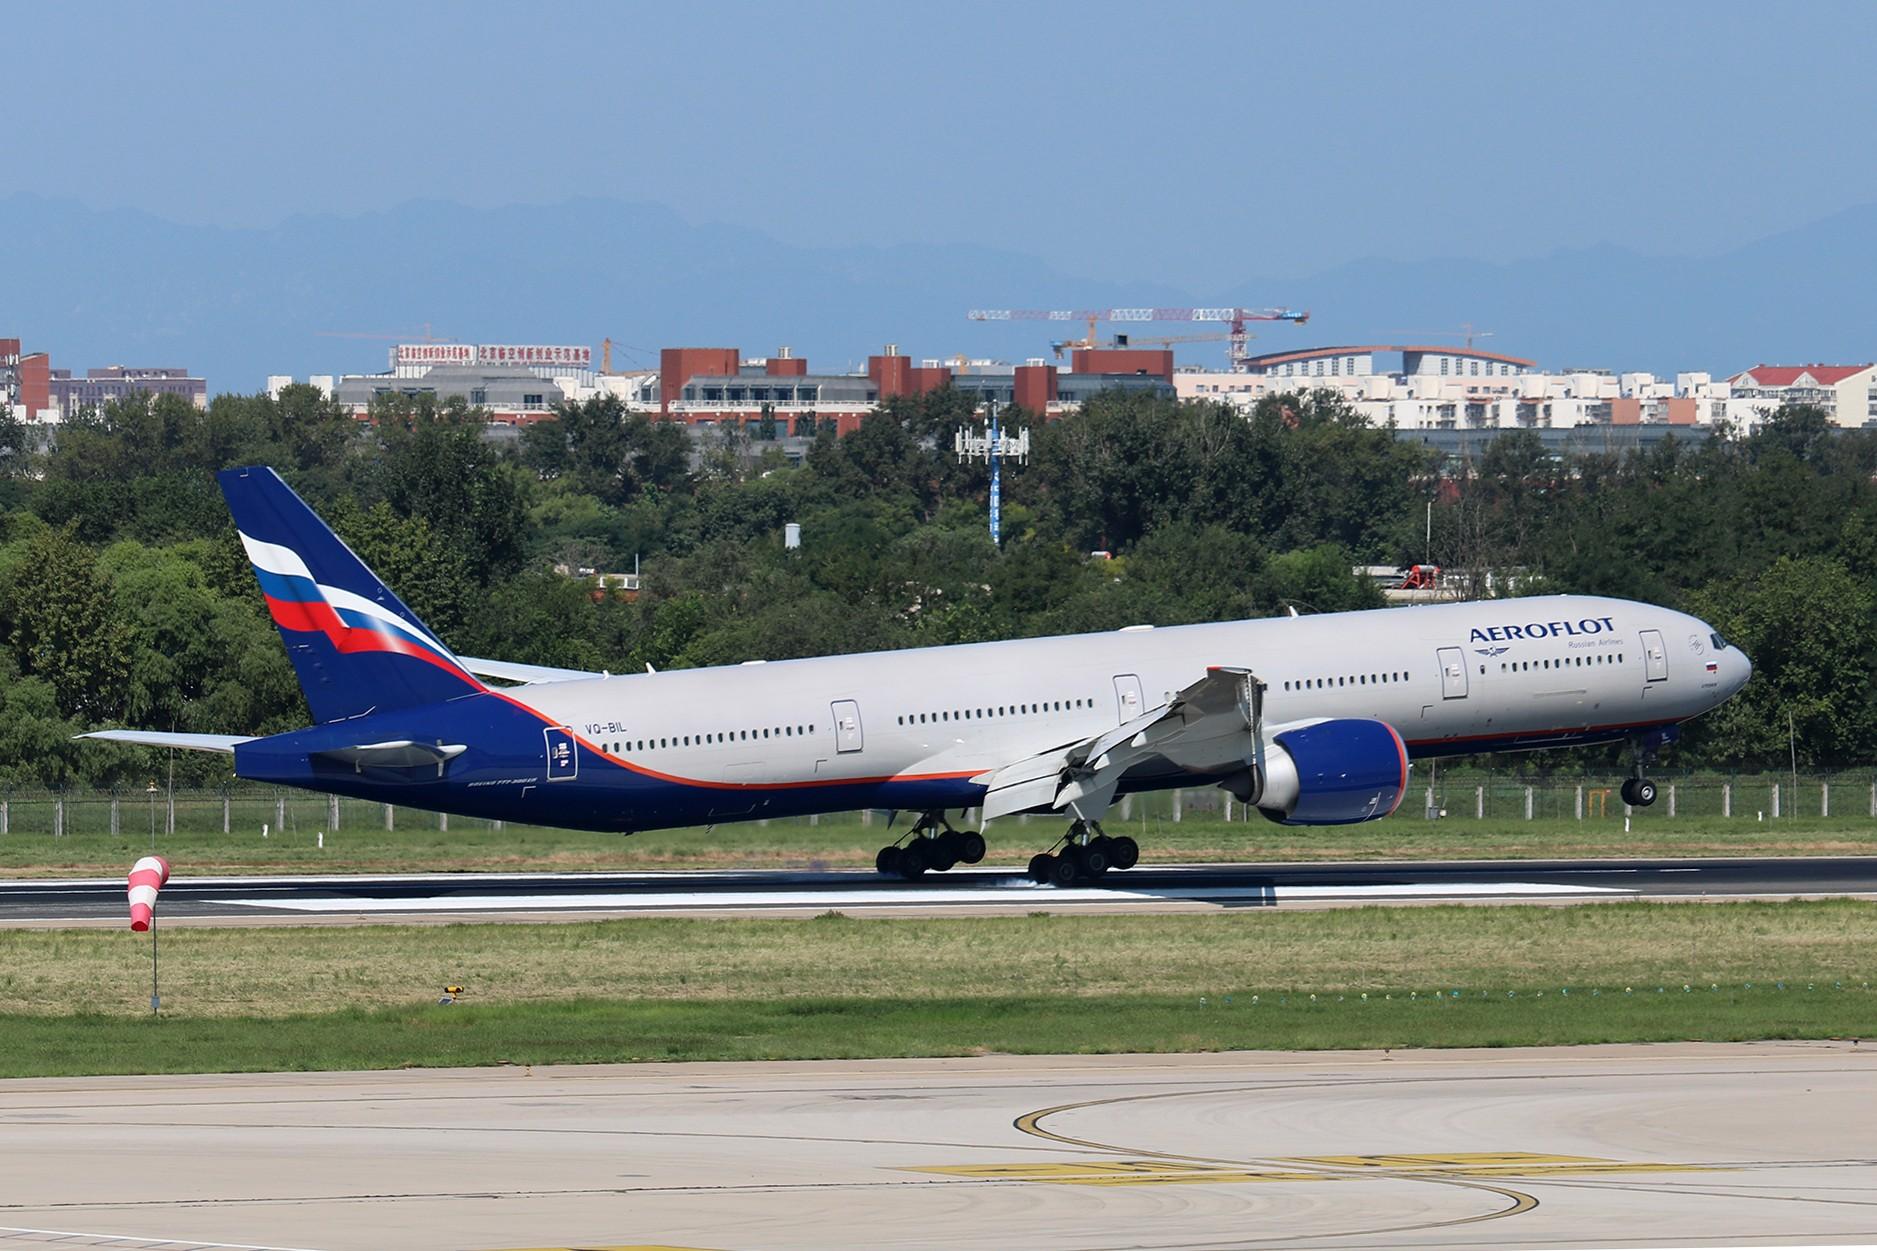 Re:[原创]LIULIU|【PEK】36L降落一组Ⅳ|擦烟 BOEING 777-300ER VQ-BIL 中国北京首都国际机场